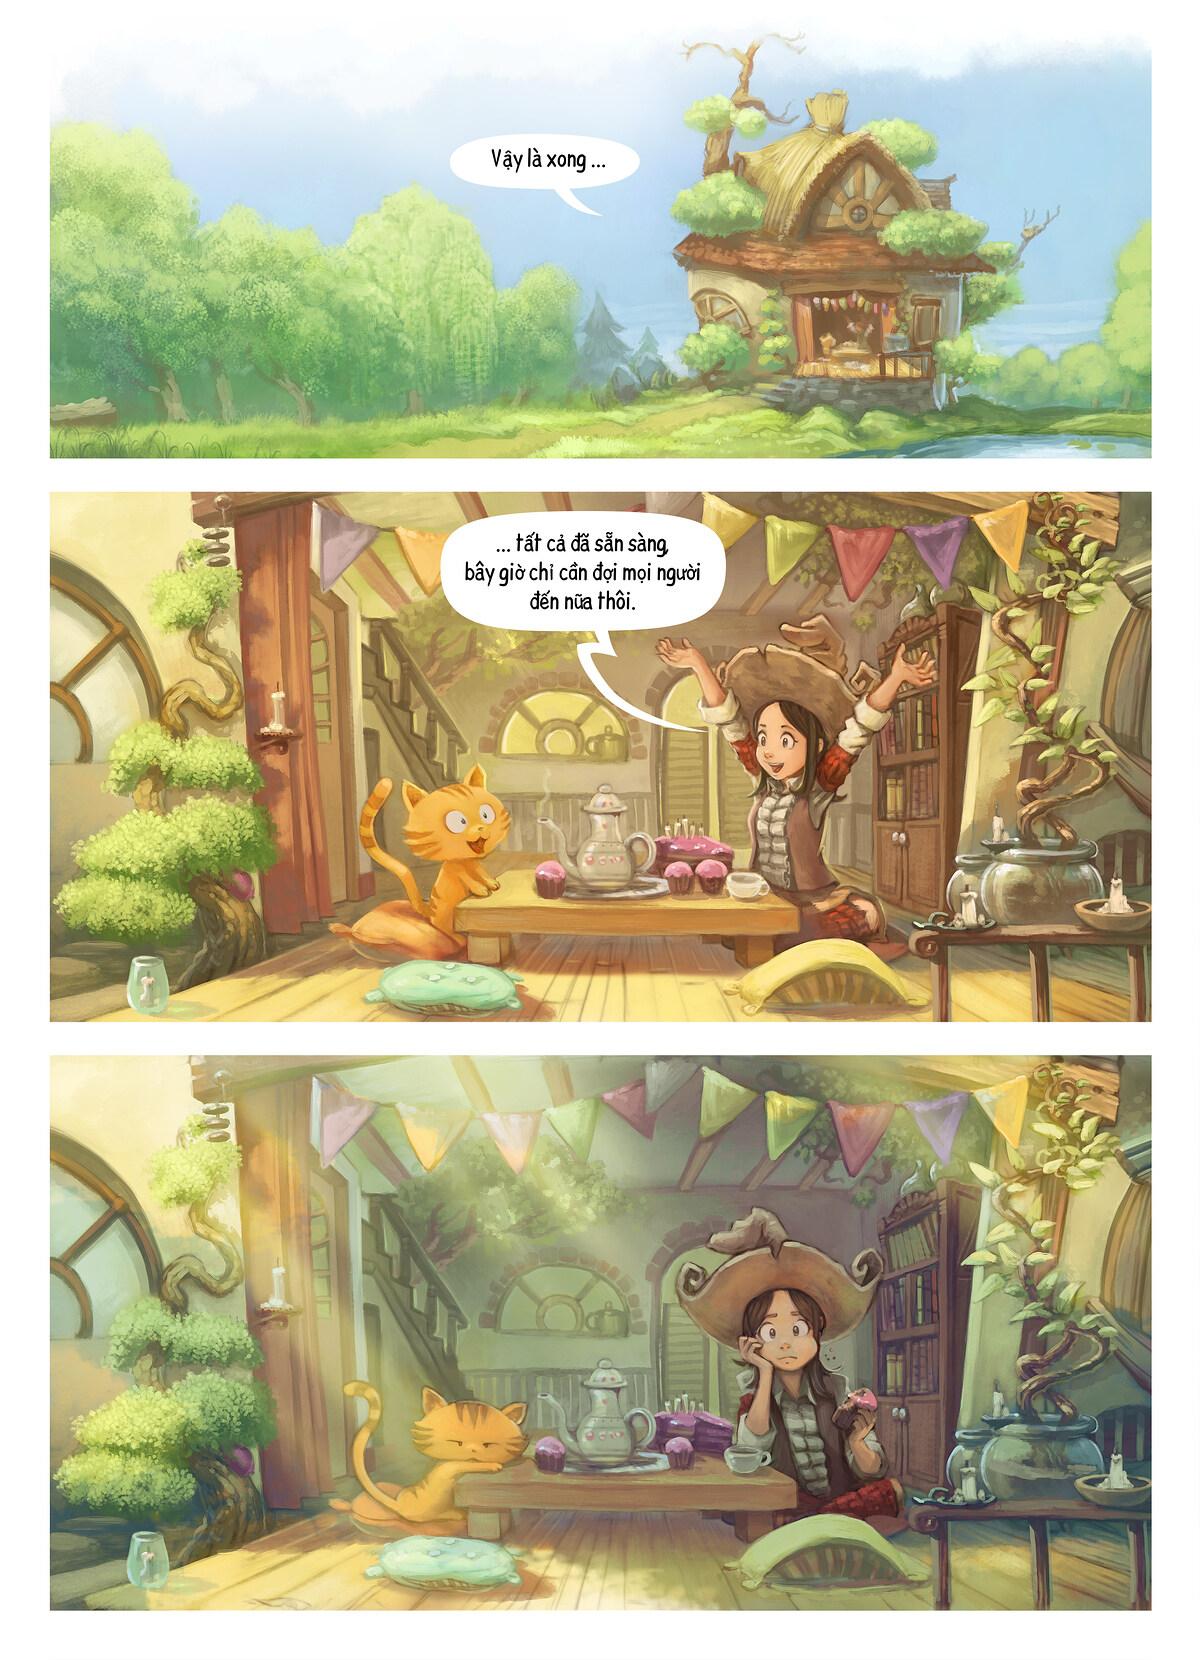 A webcomic page of Pepper&Carrot, Tập 8 [vi], trang 3